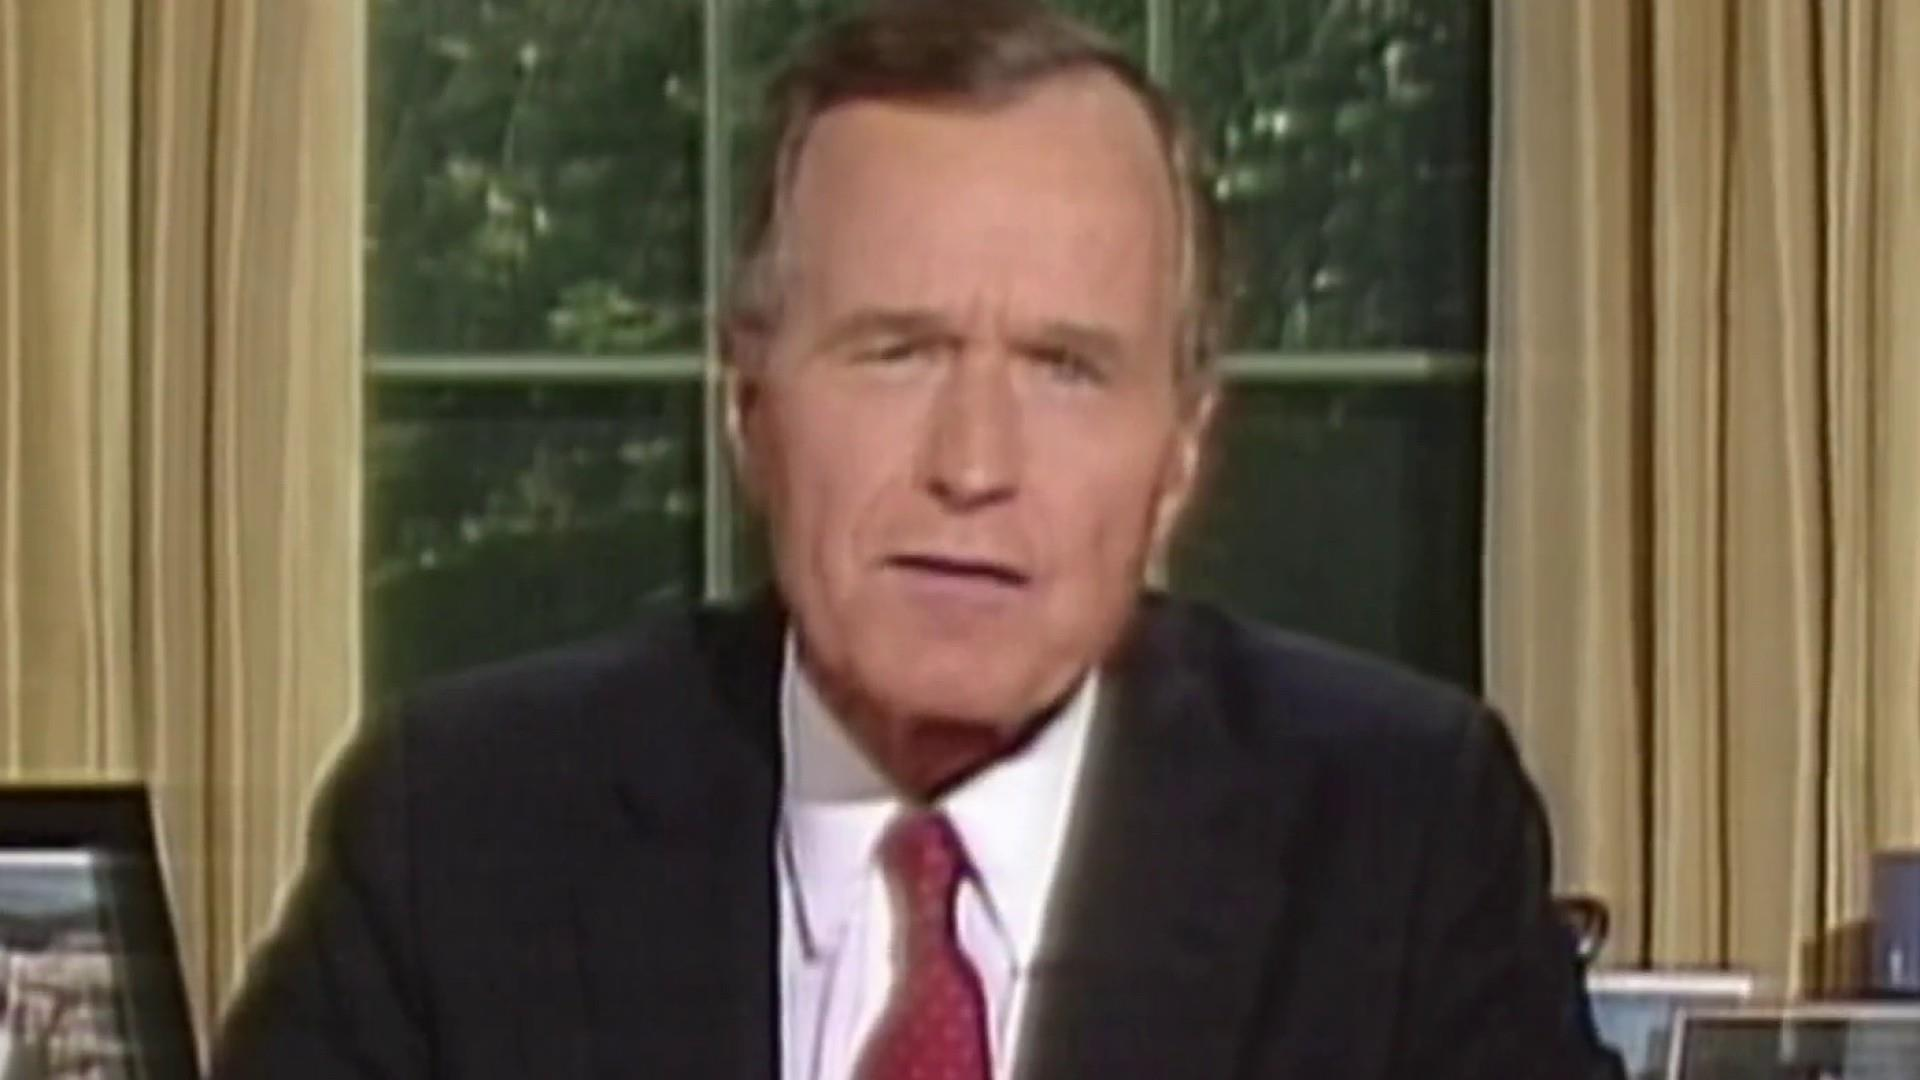 McCaffrey: Bush 'understood the consequences of war'